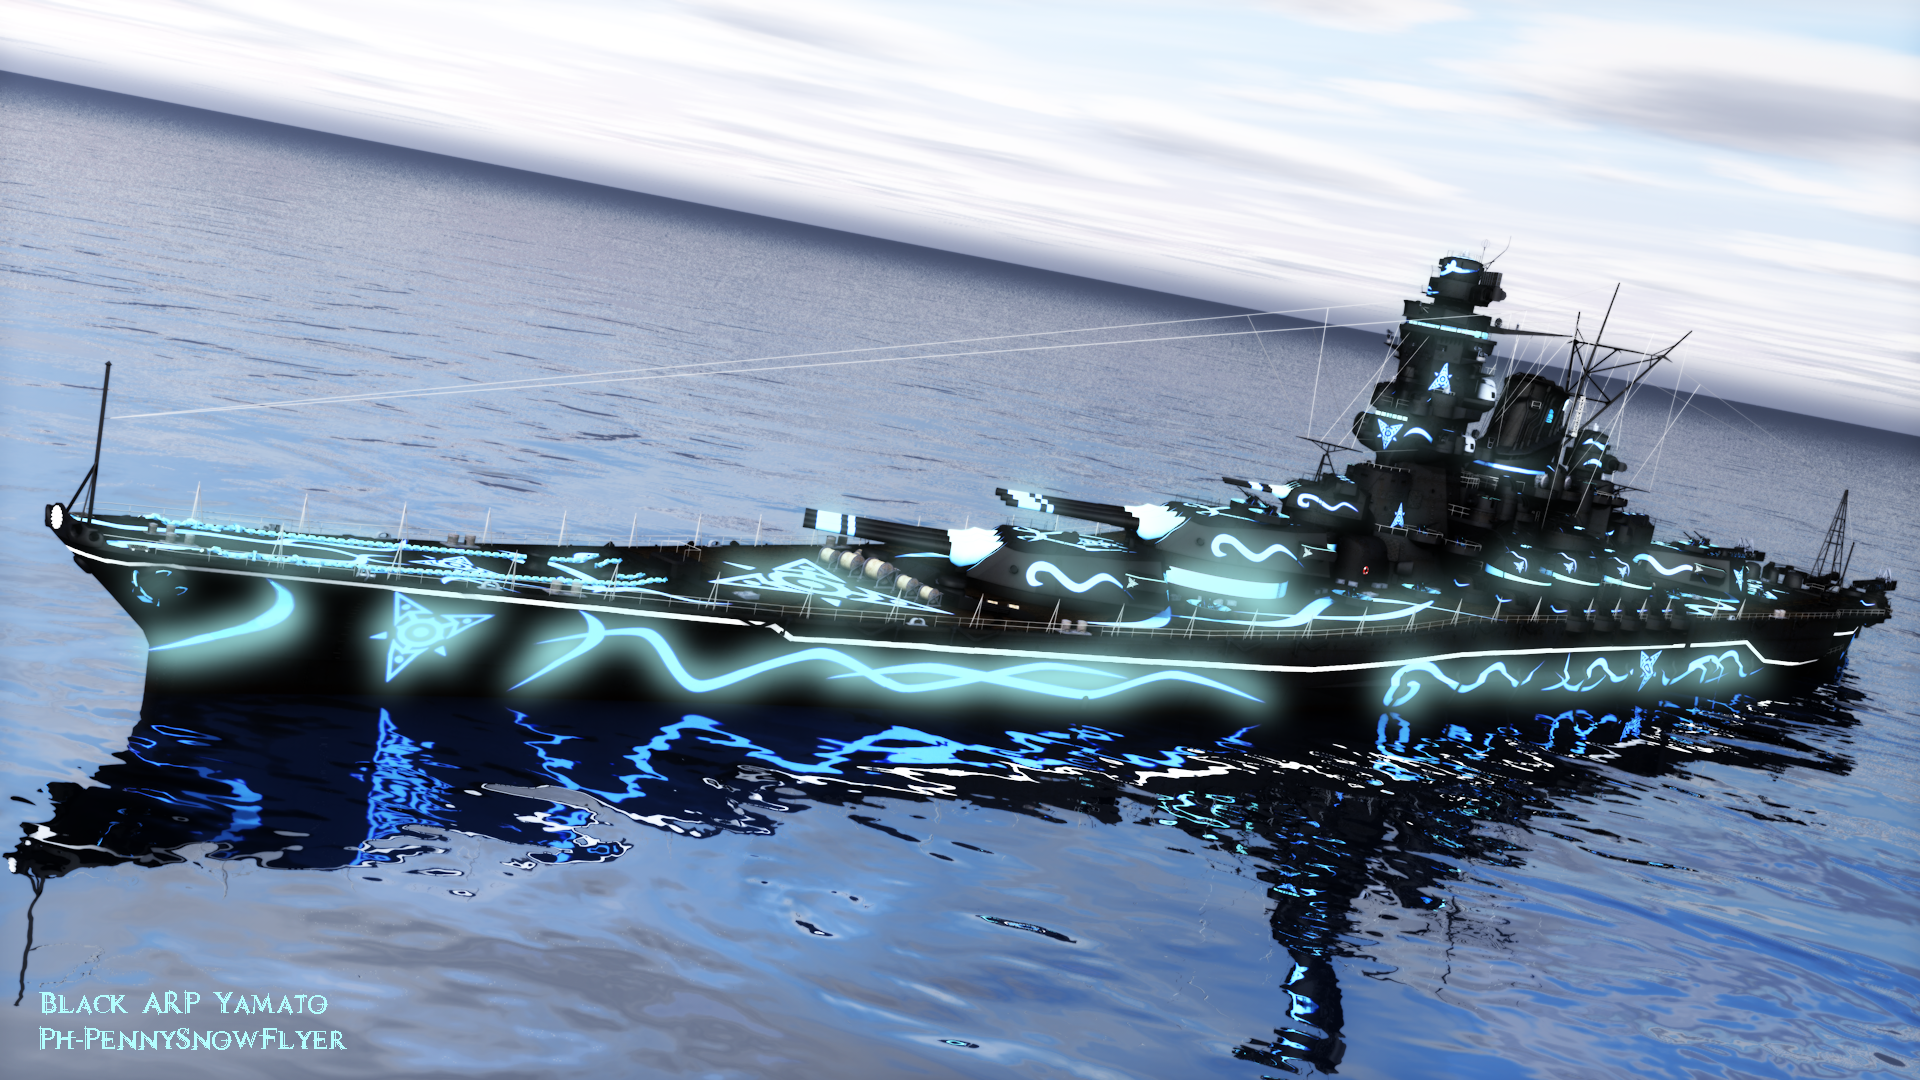 World of Warships: Black ARP Yamato by PH-PennySnowFlyer